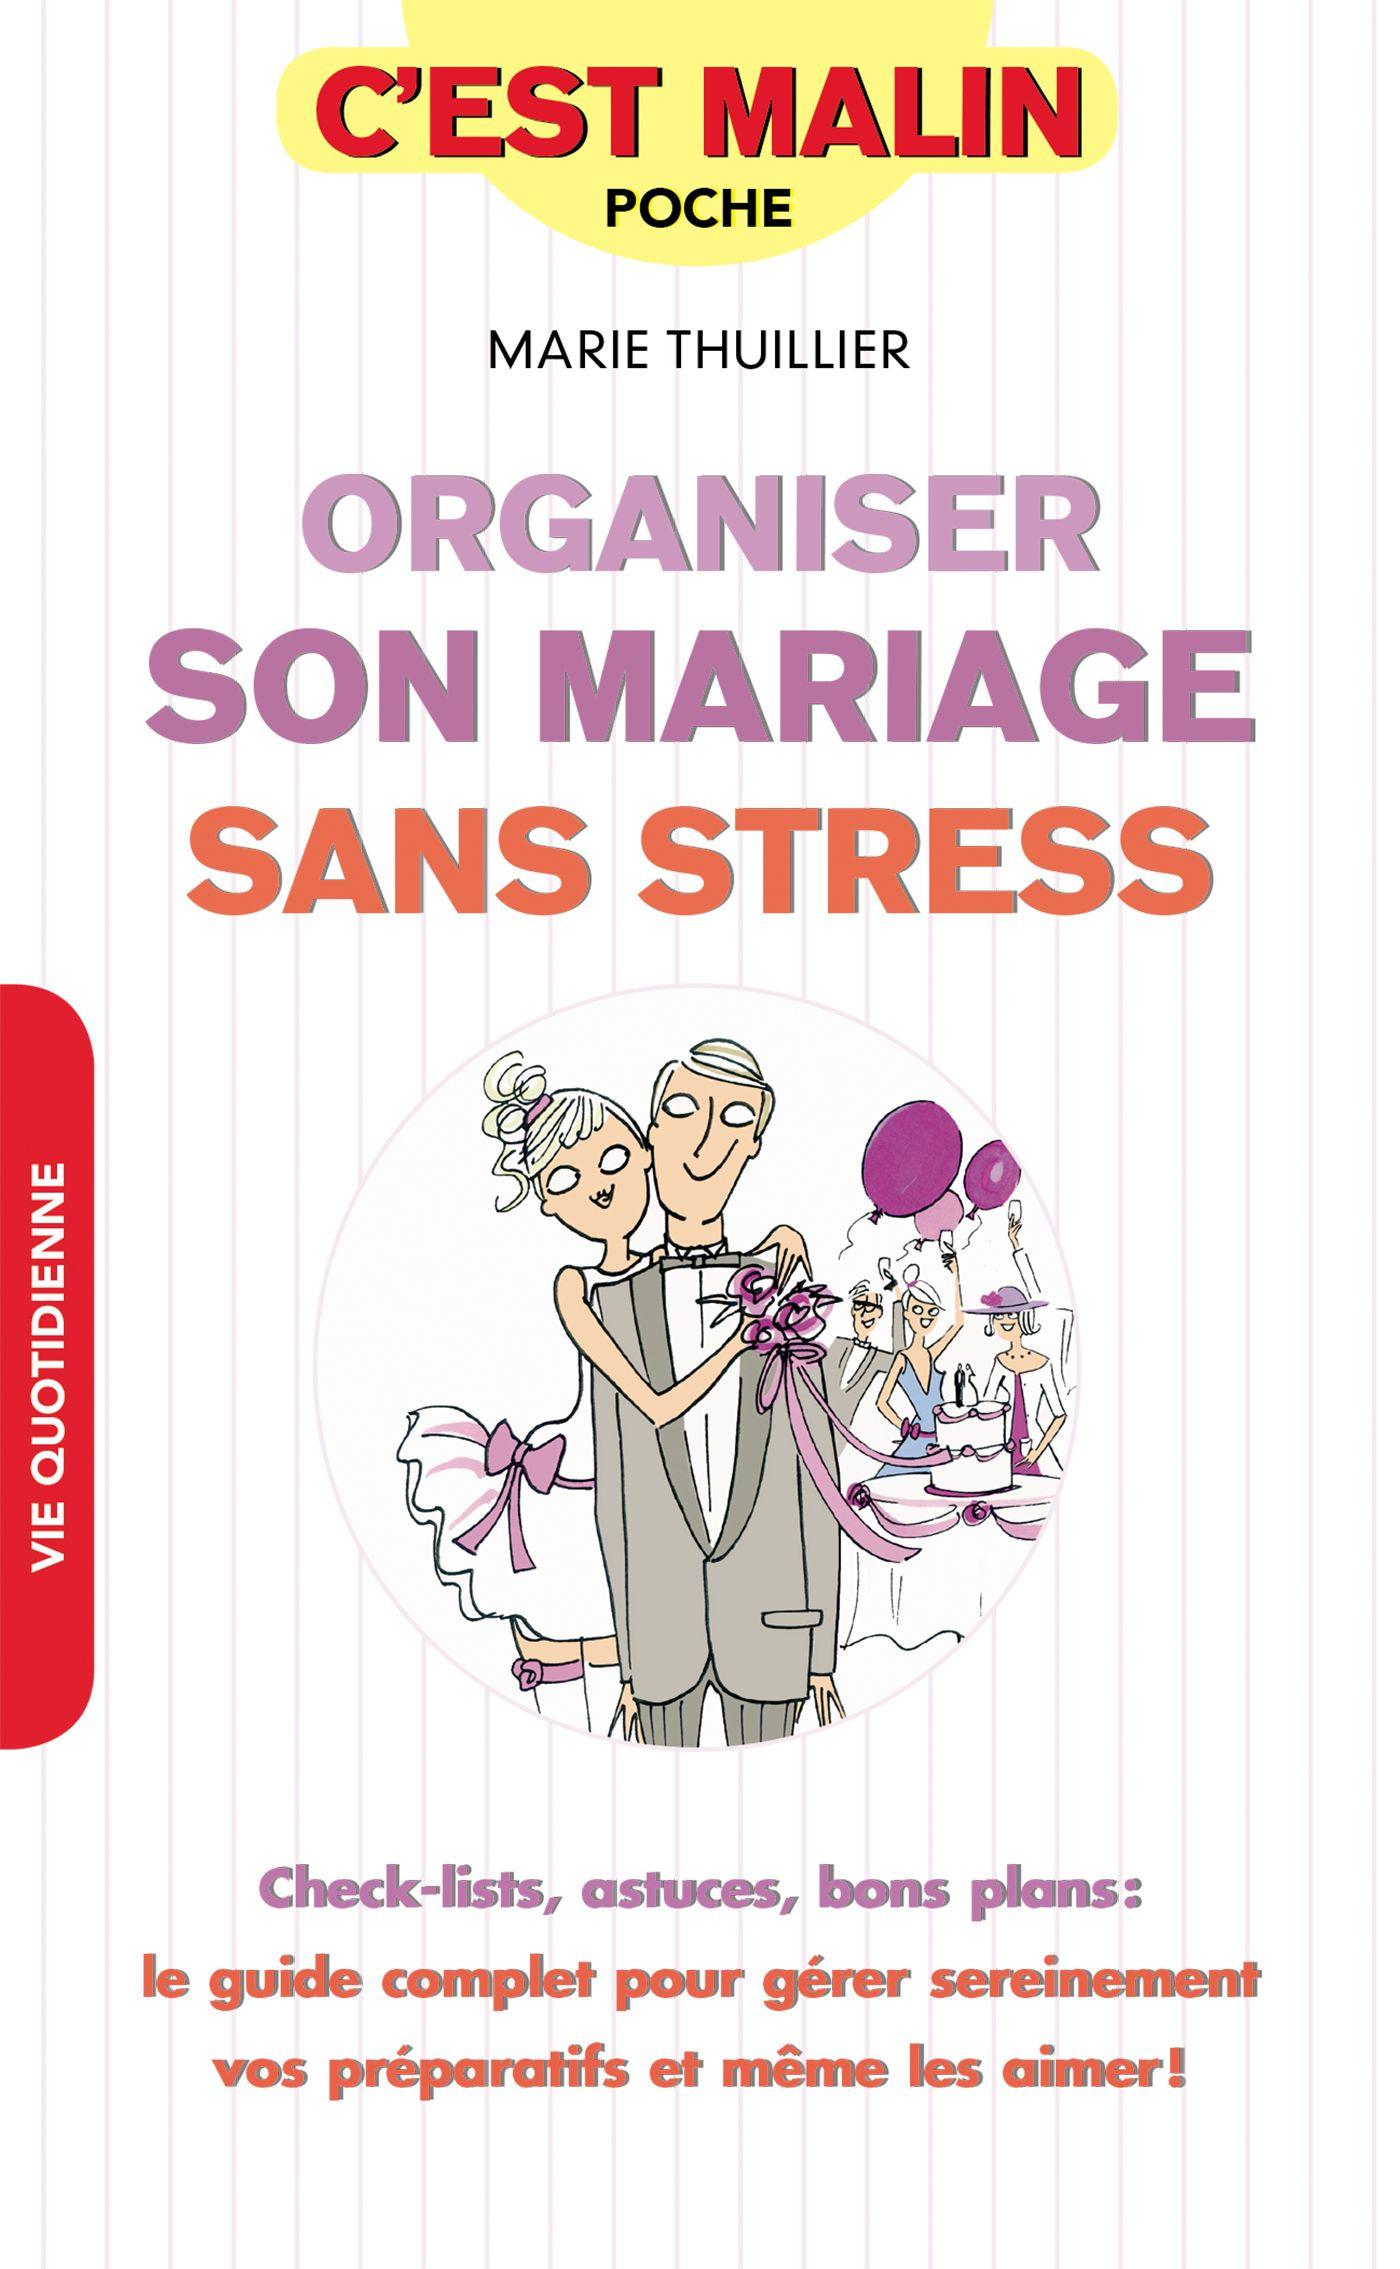 Organiser son mariage sans stress, c'est malin